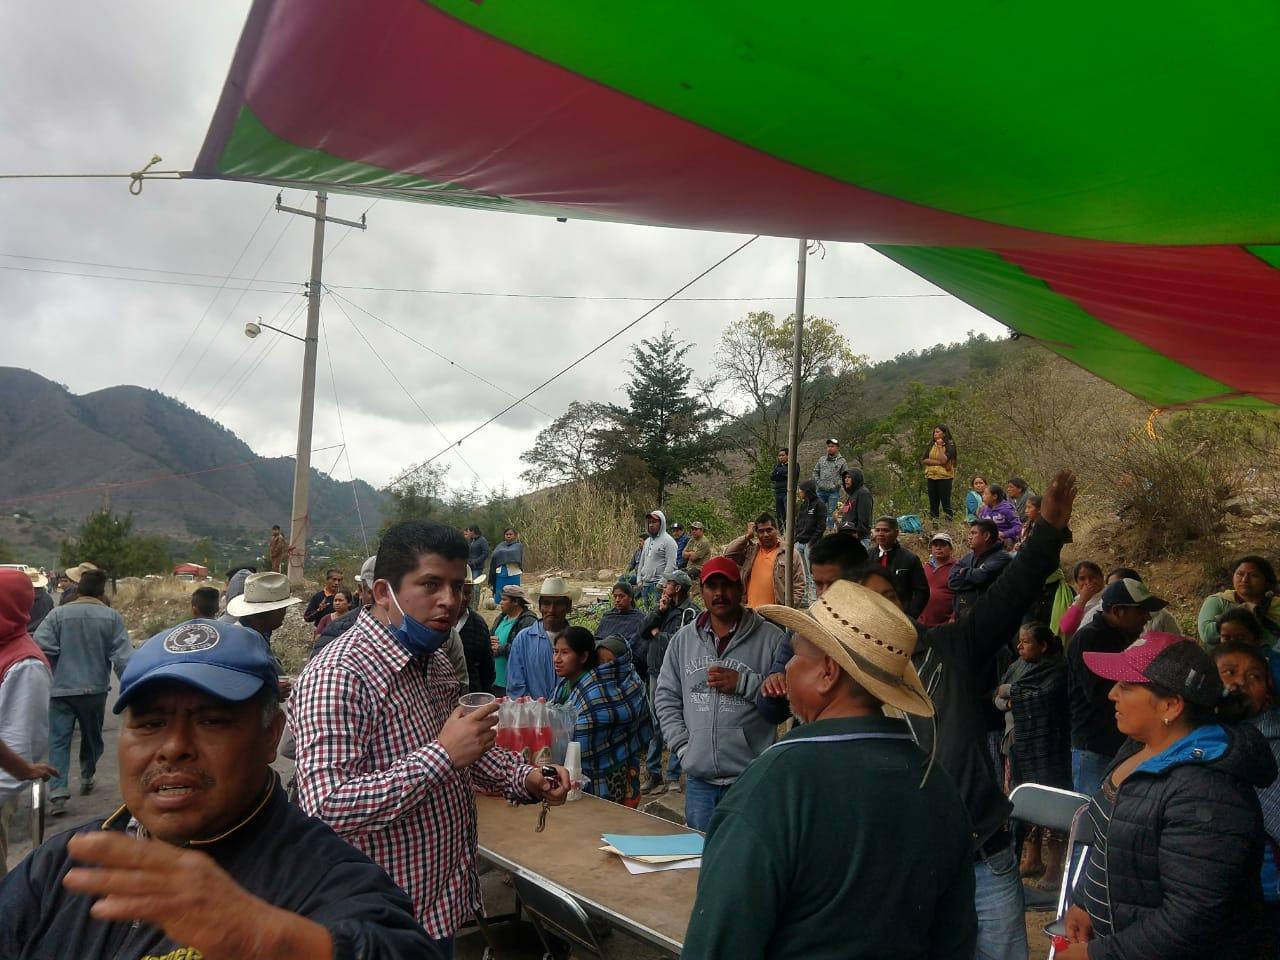 Van tres días de protesta en Zautla por falta de apoyo ante Covid-19